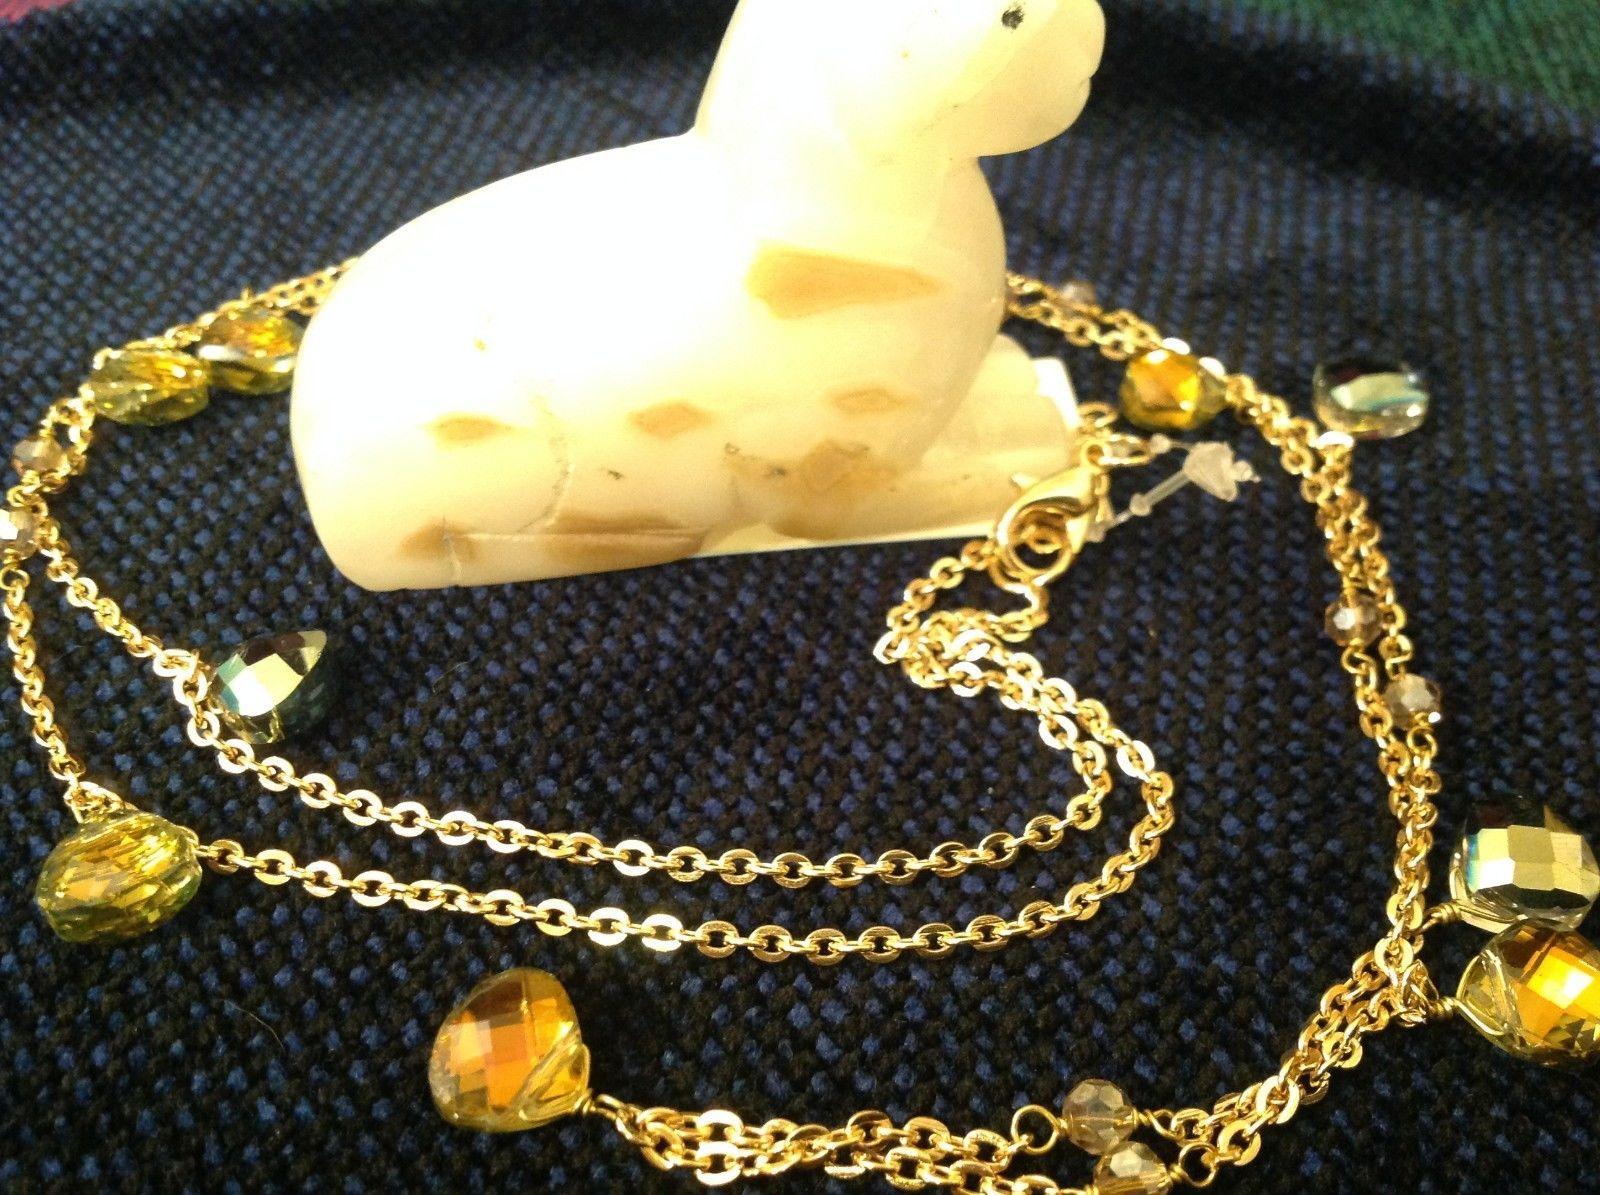 18 Inch Elly Preston Thai Faceted Crystal Pendant Necklace aurora borealis